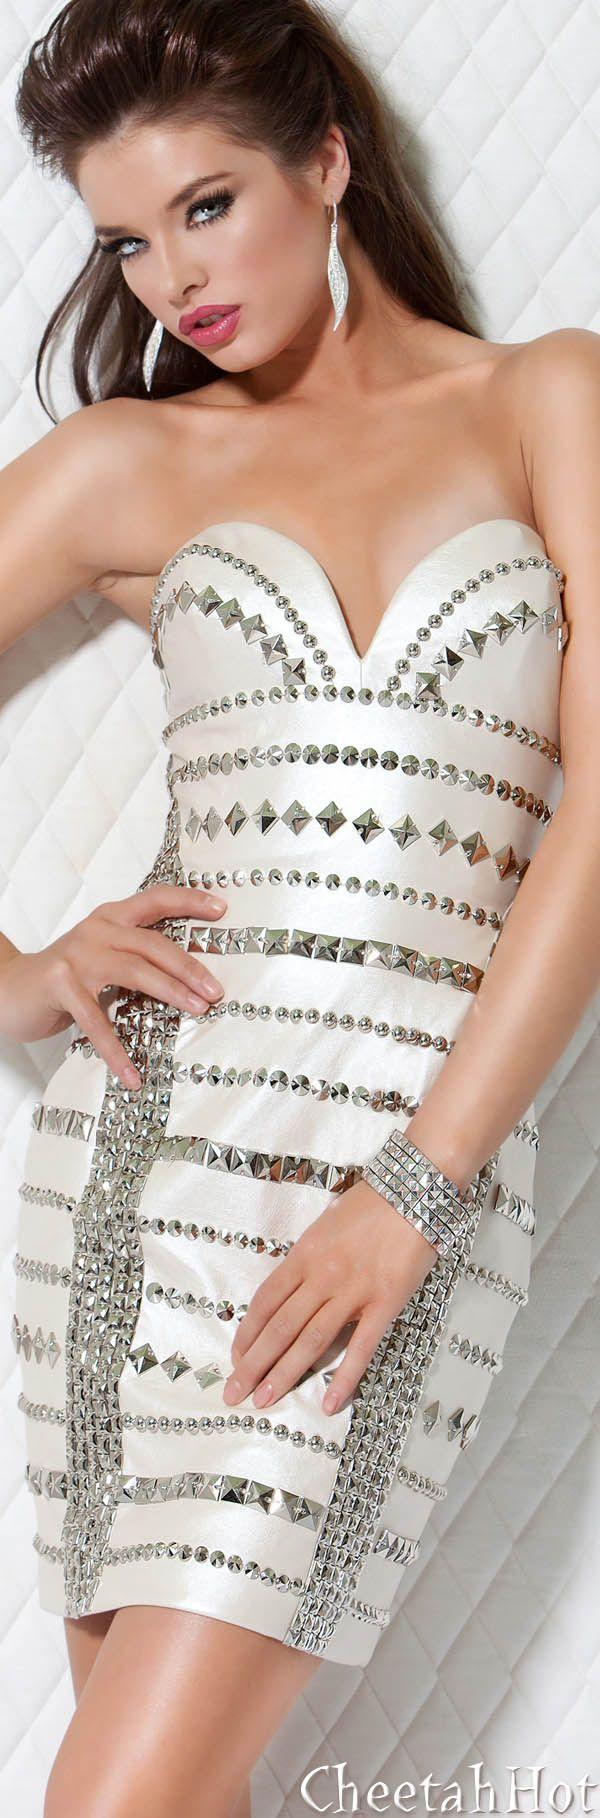 best vegas outfits images on pinterest short dresses short